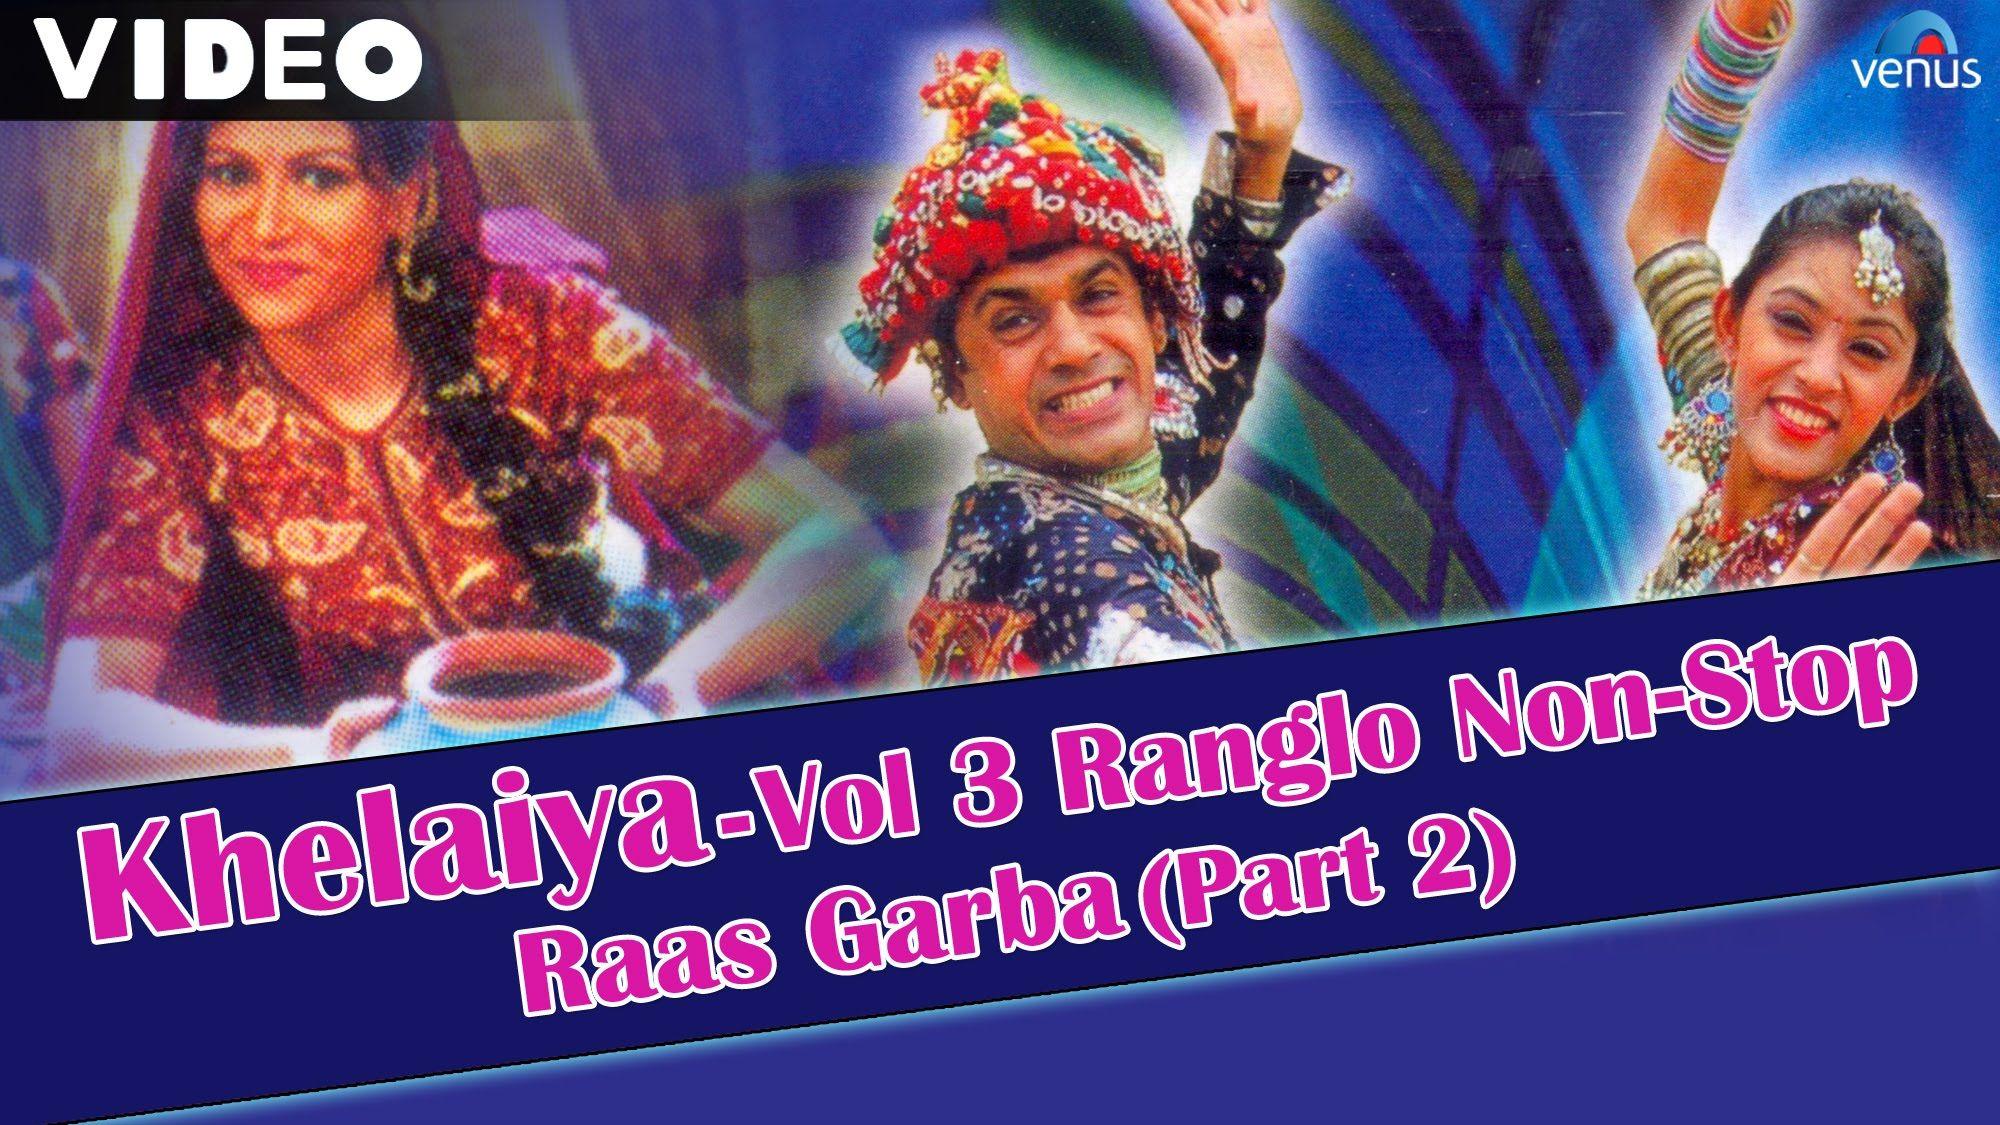 Khelaiya Vol 3 Ranglo Non Stop Raas Garba Part 2 Popular Dandiya Navratri Songs Garba Songs Songs